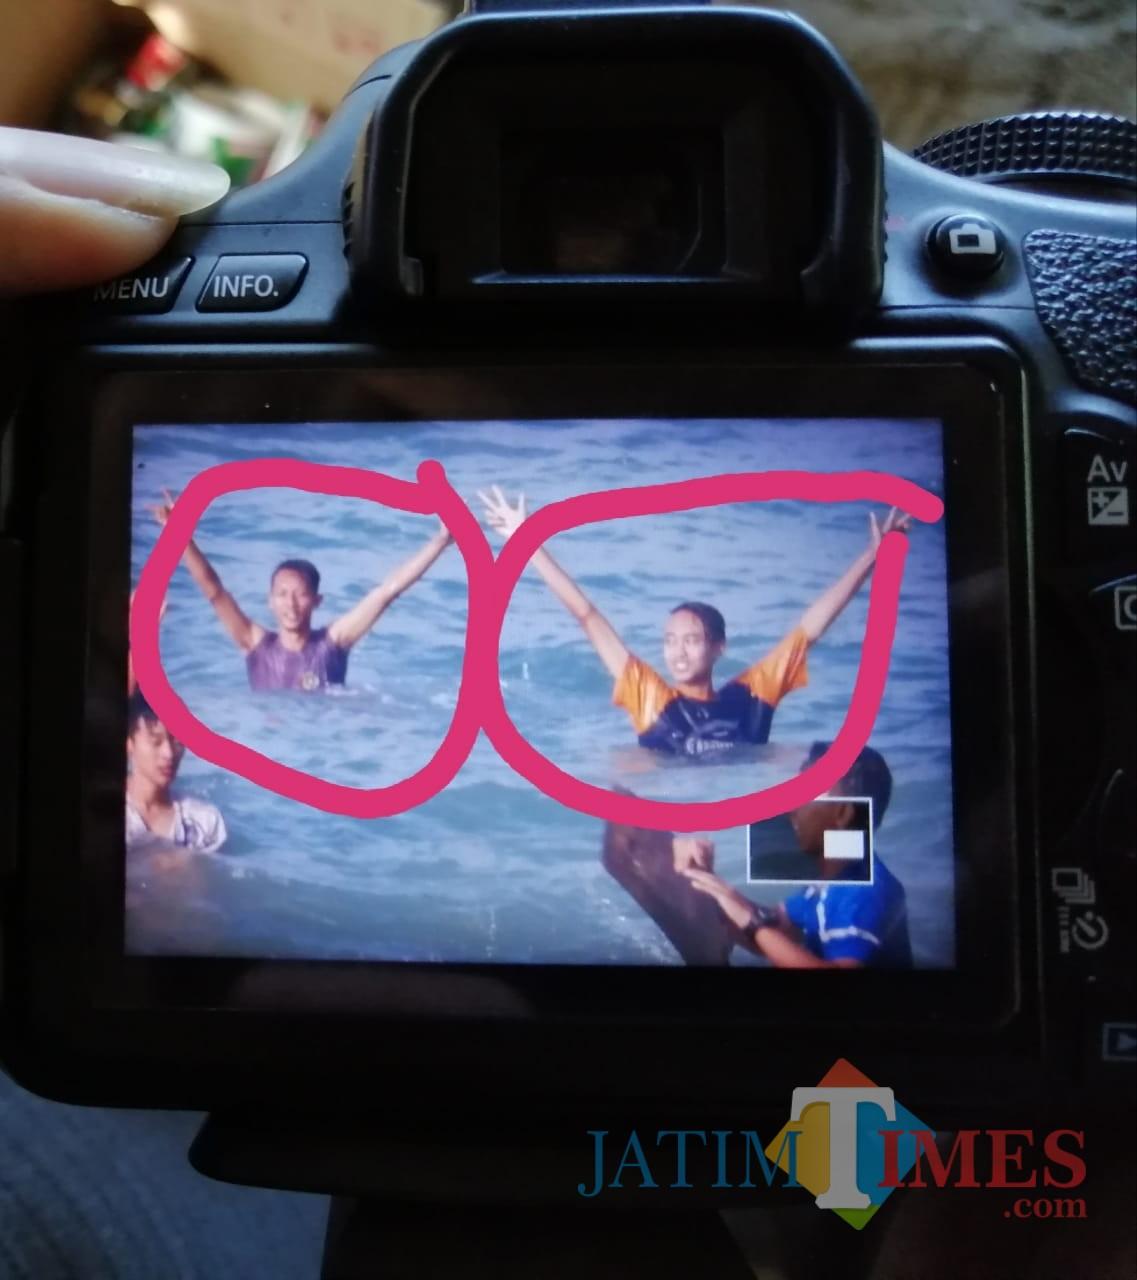 Kedua korban (dilingkari) asal Jombang dilaporkan hilang di Pantai Pangi.